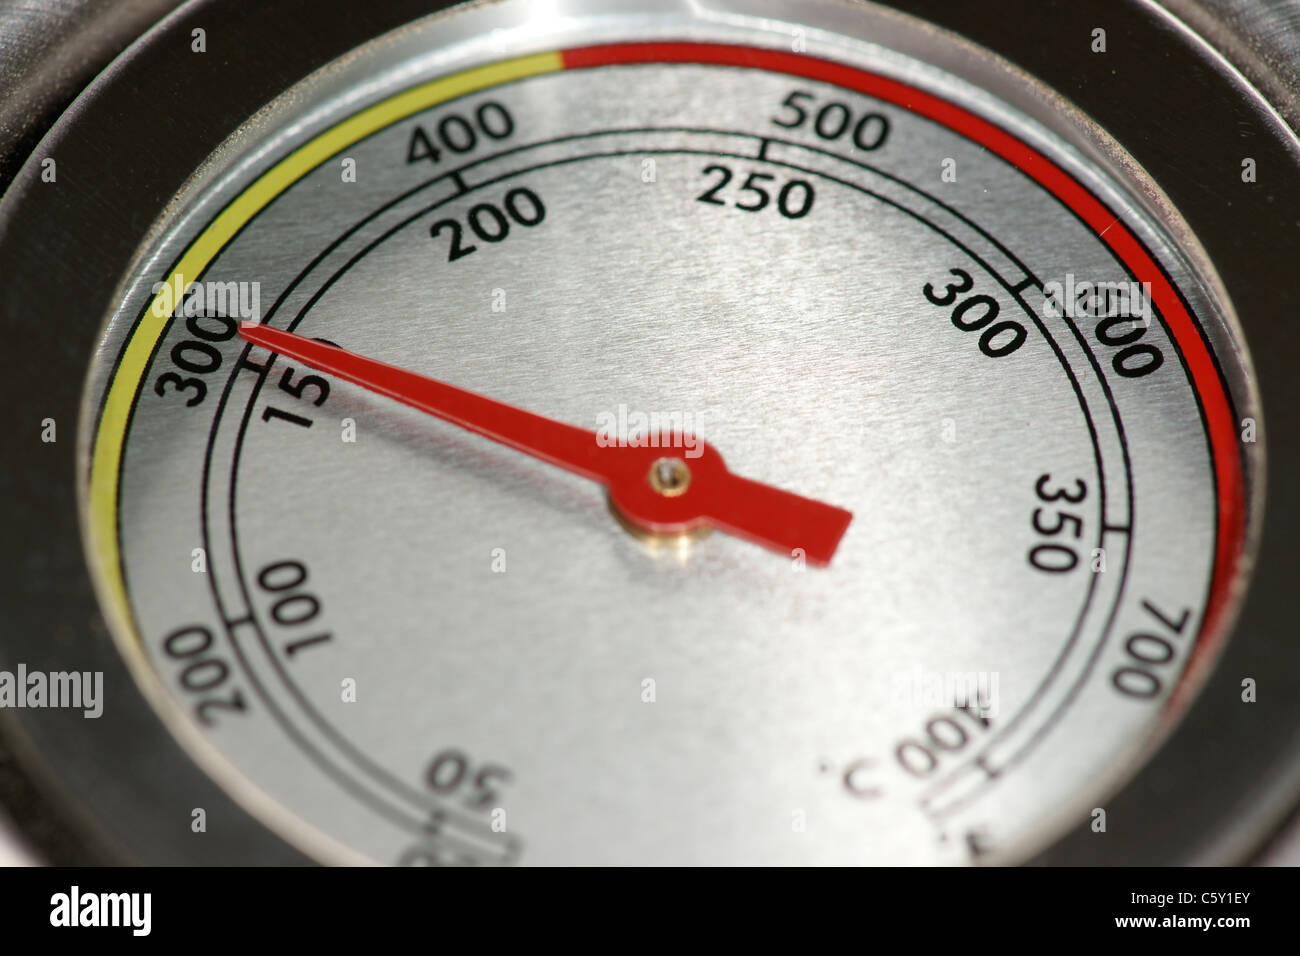 Indicatore di temperatura Immagini Stock